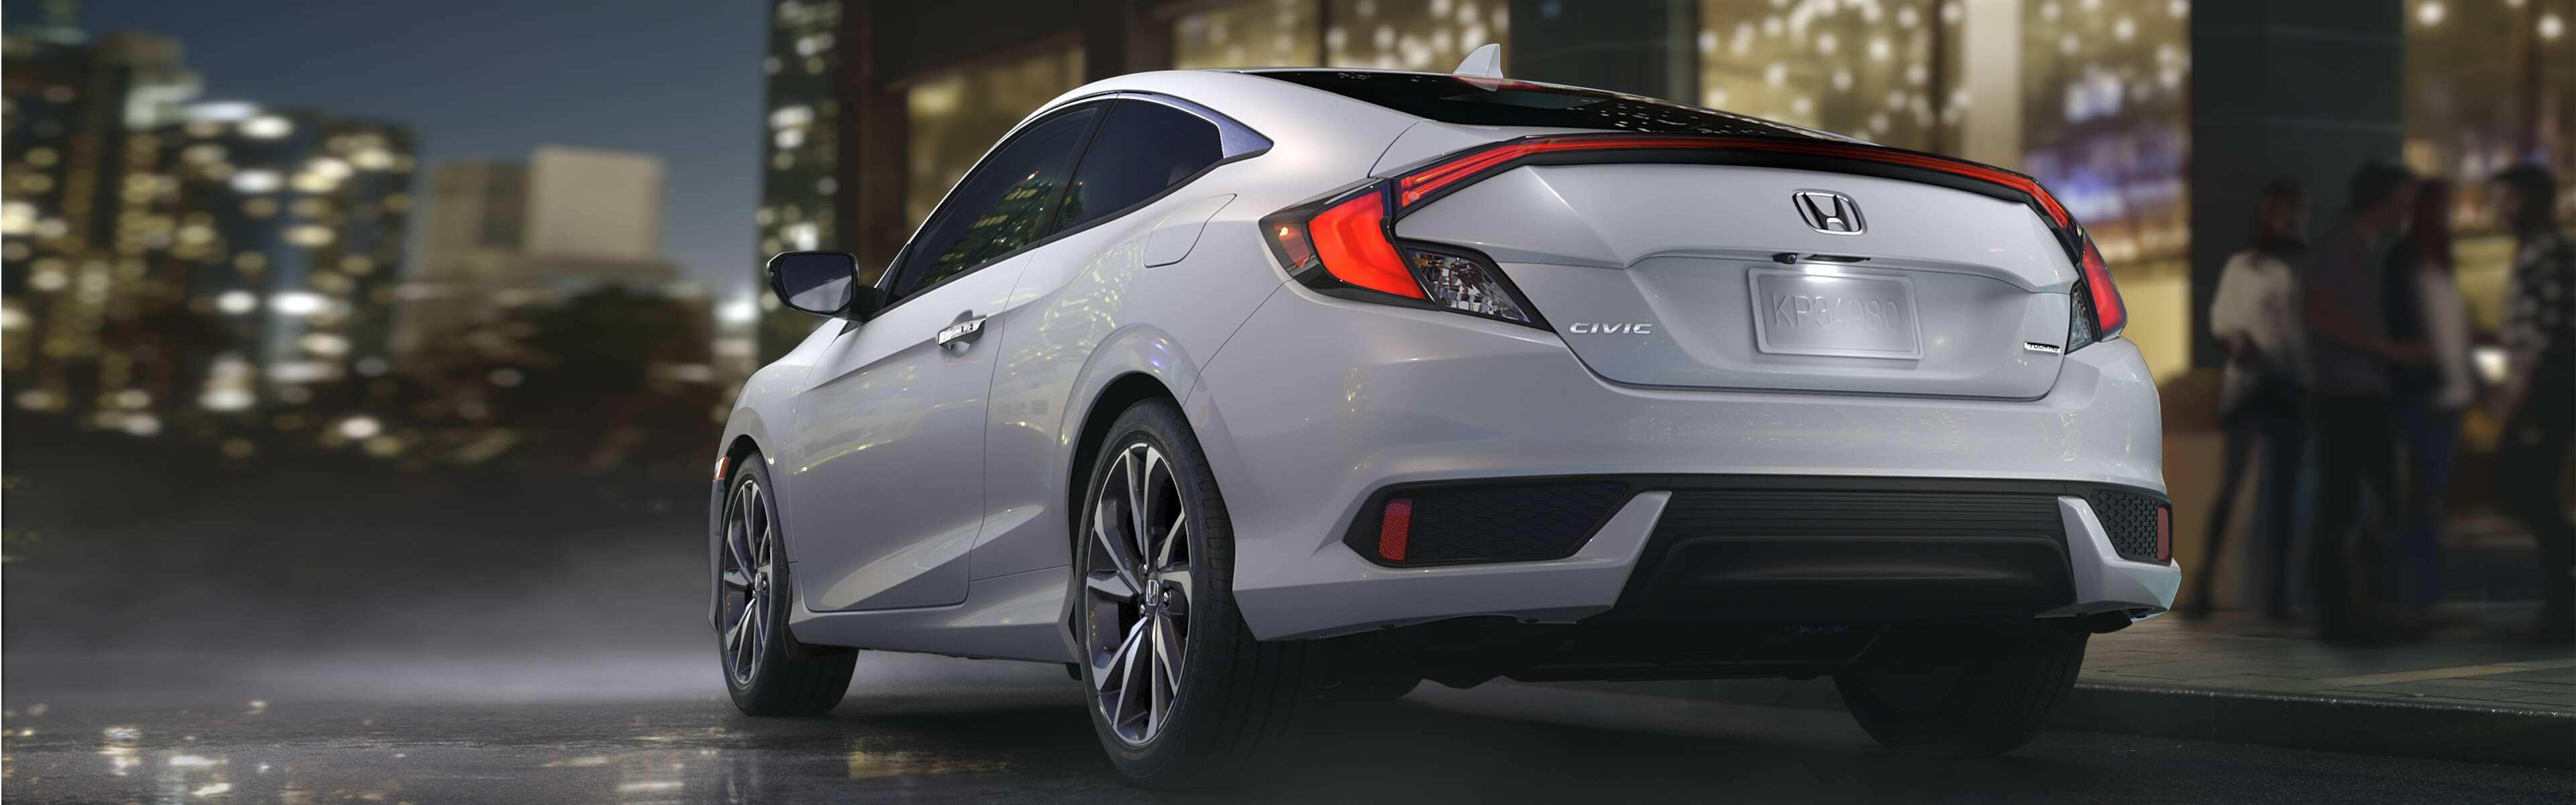 21 Gallery of Honda Civic Kombi 2020 Speed Test for Honda Civic Kombi 2020